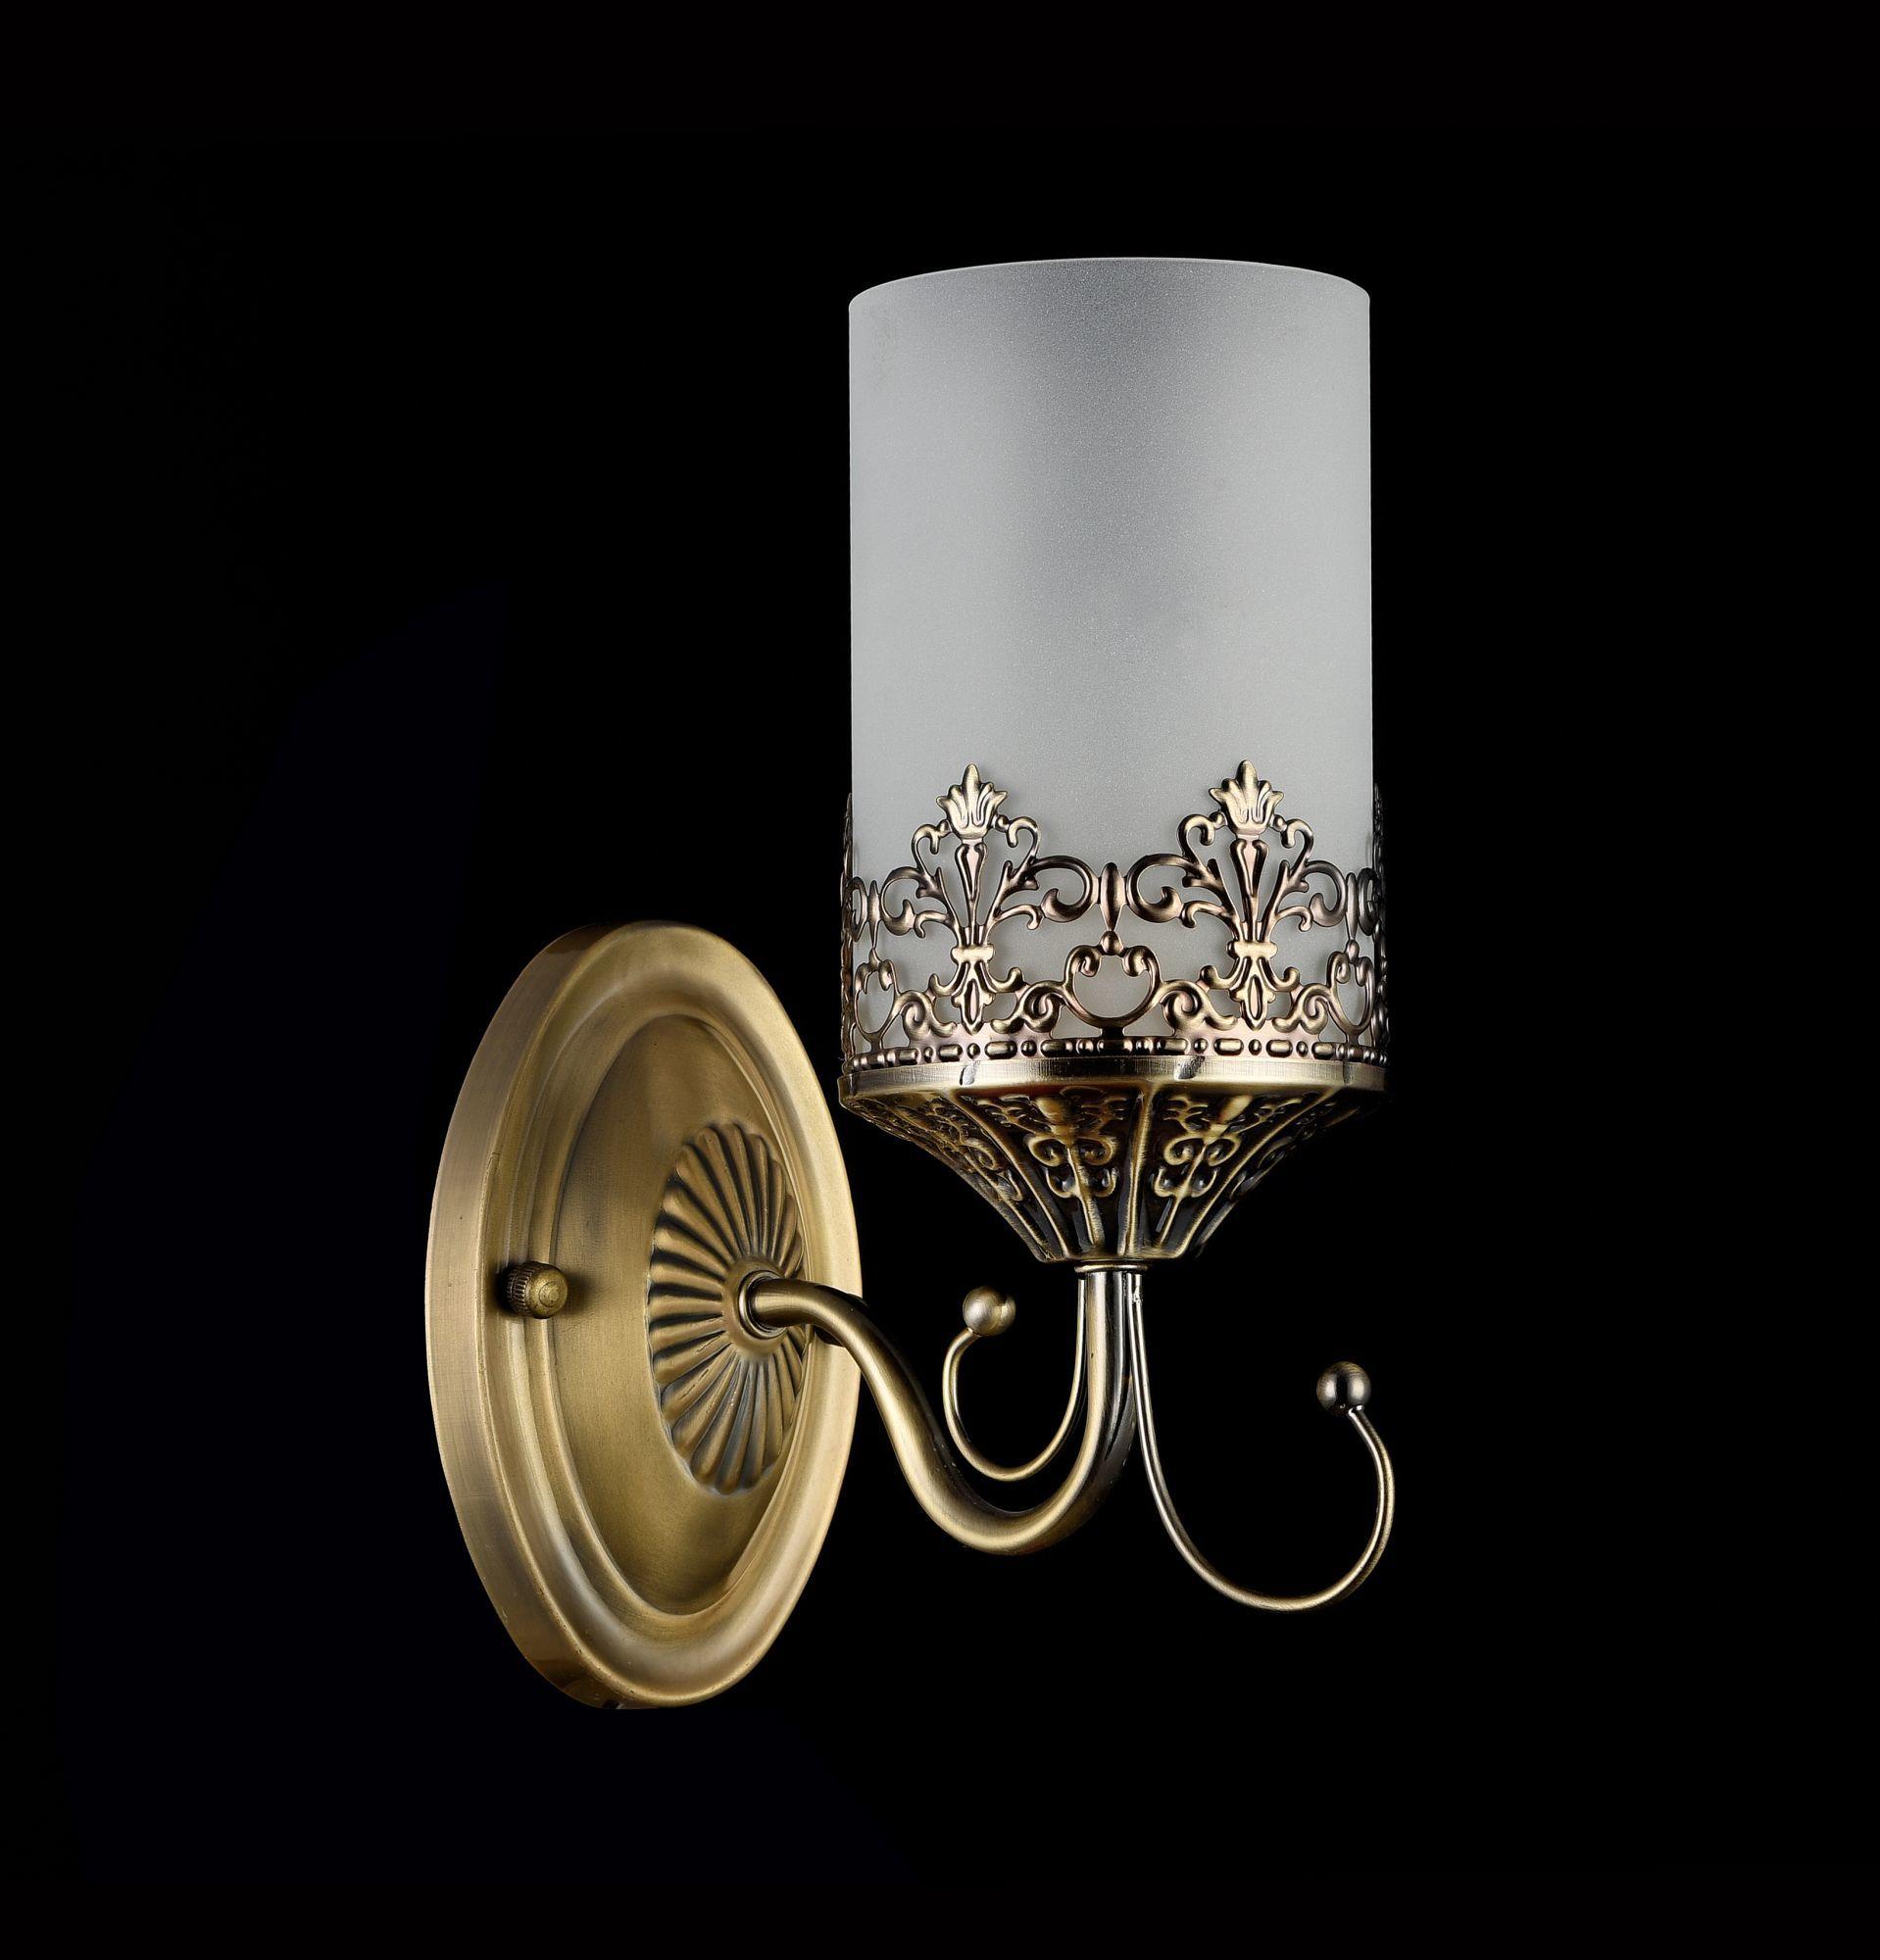 Бра Freya Sherborne FR2563-WL-01-BZ (arm563-01-r), 1xE14x60W, бронза, белый, металл, стекло - фото 2